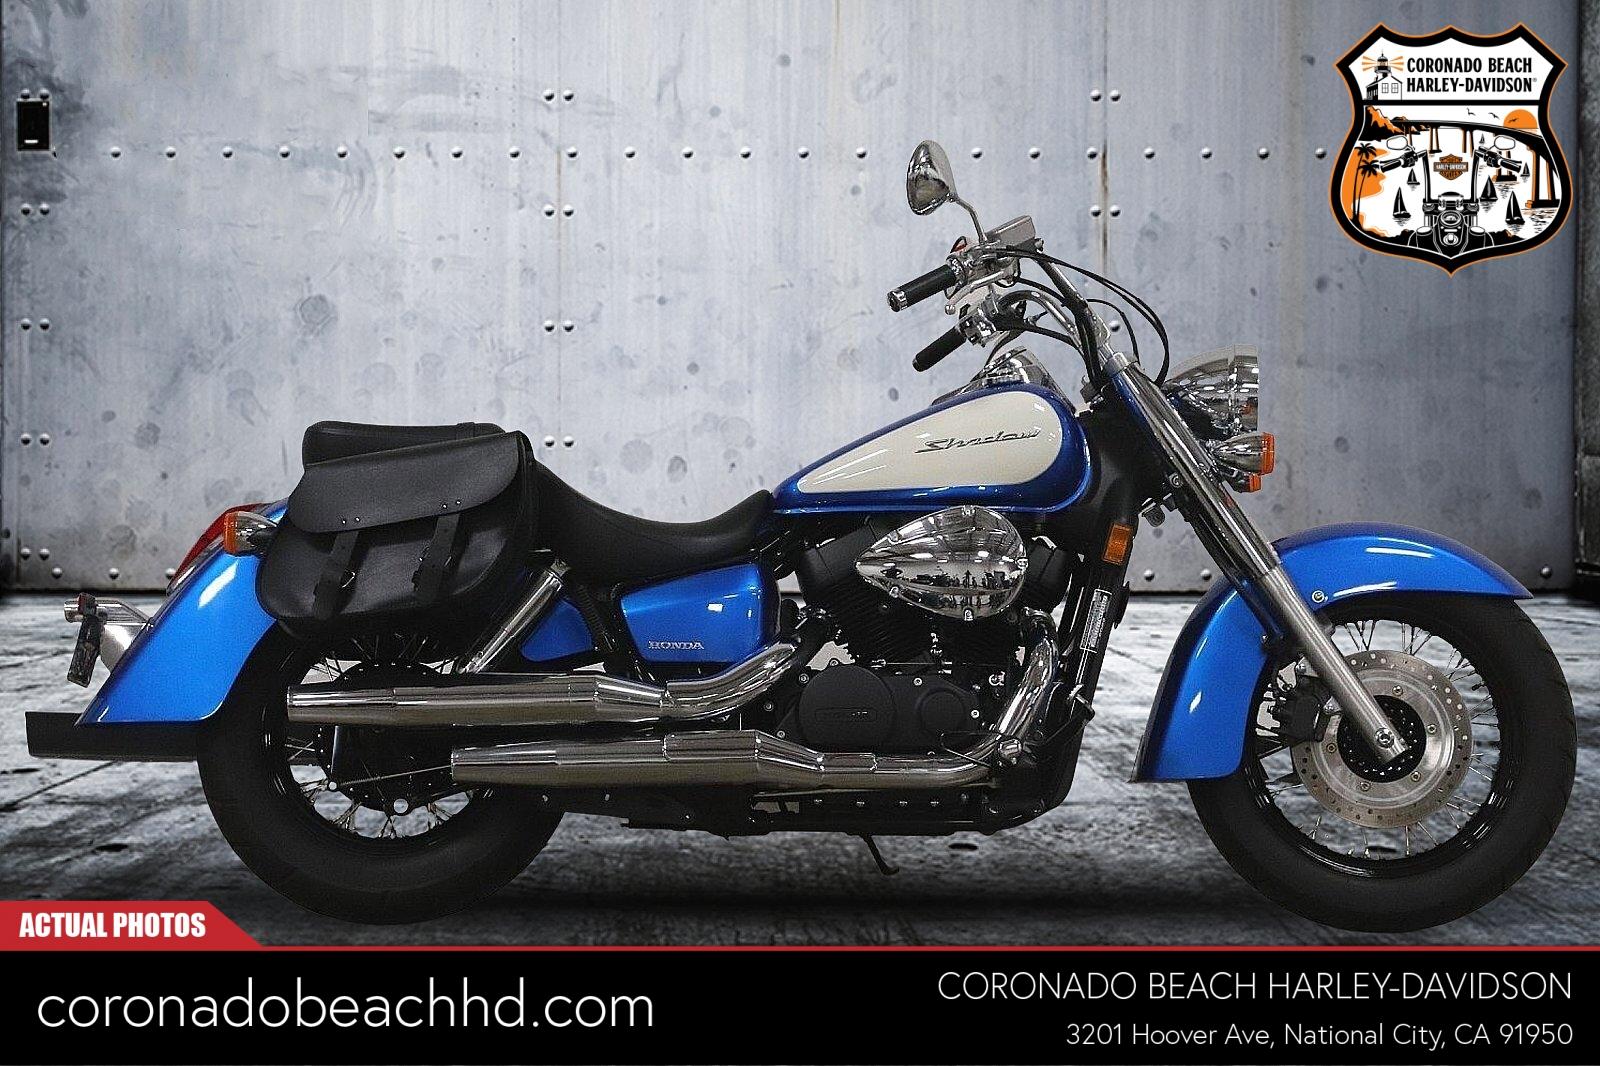 2022 Honda Shadow 800 [9]